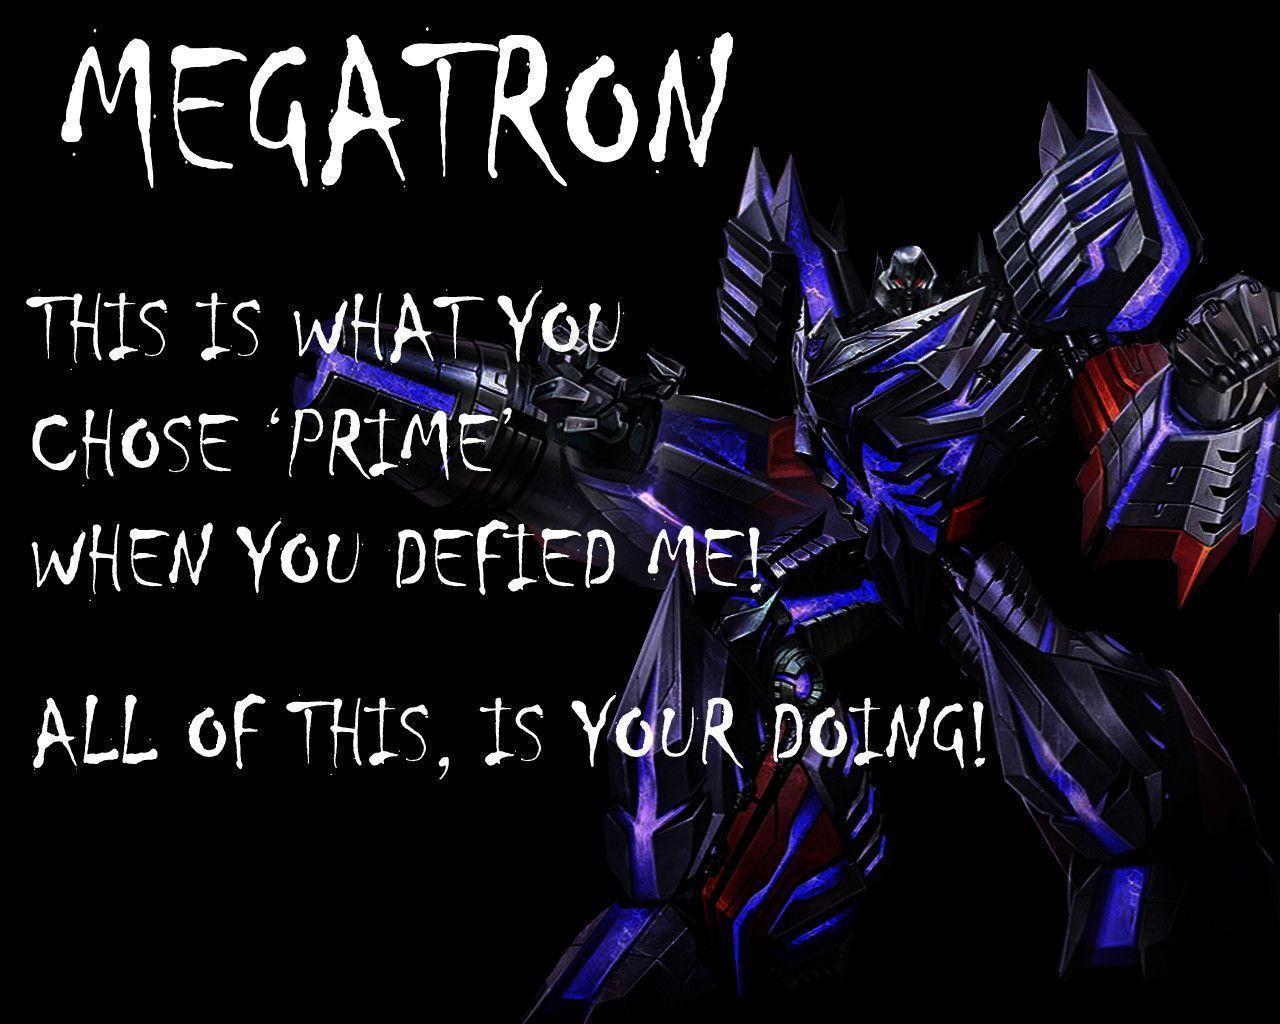 Transformers Fall Of Cybertron Wallpaper Hd Fall Of Cybertron Wallpapers Wallpaper Cave